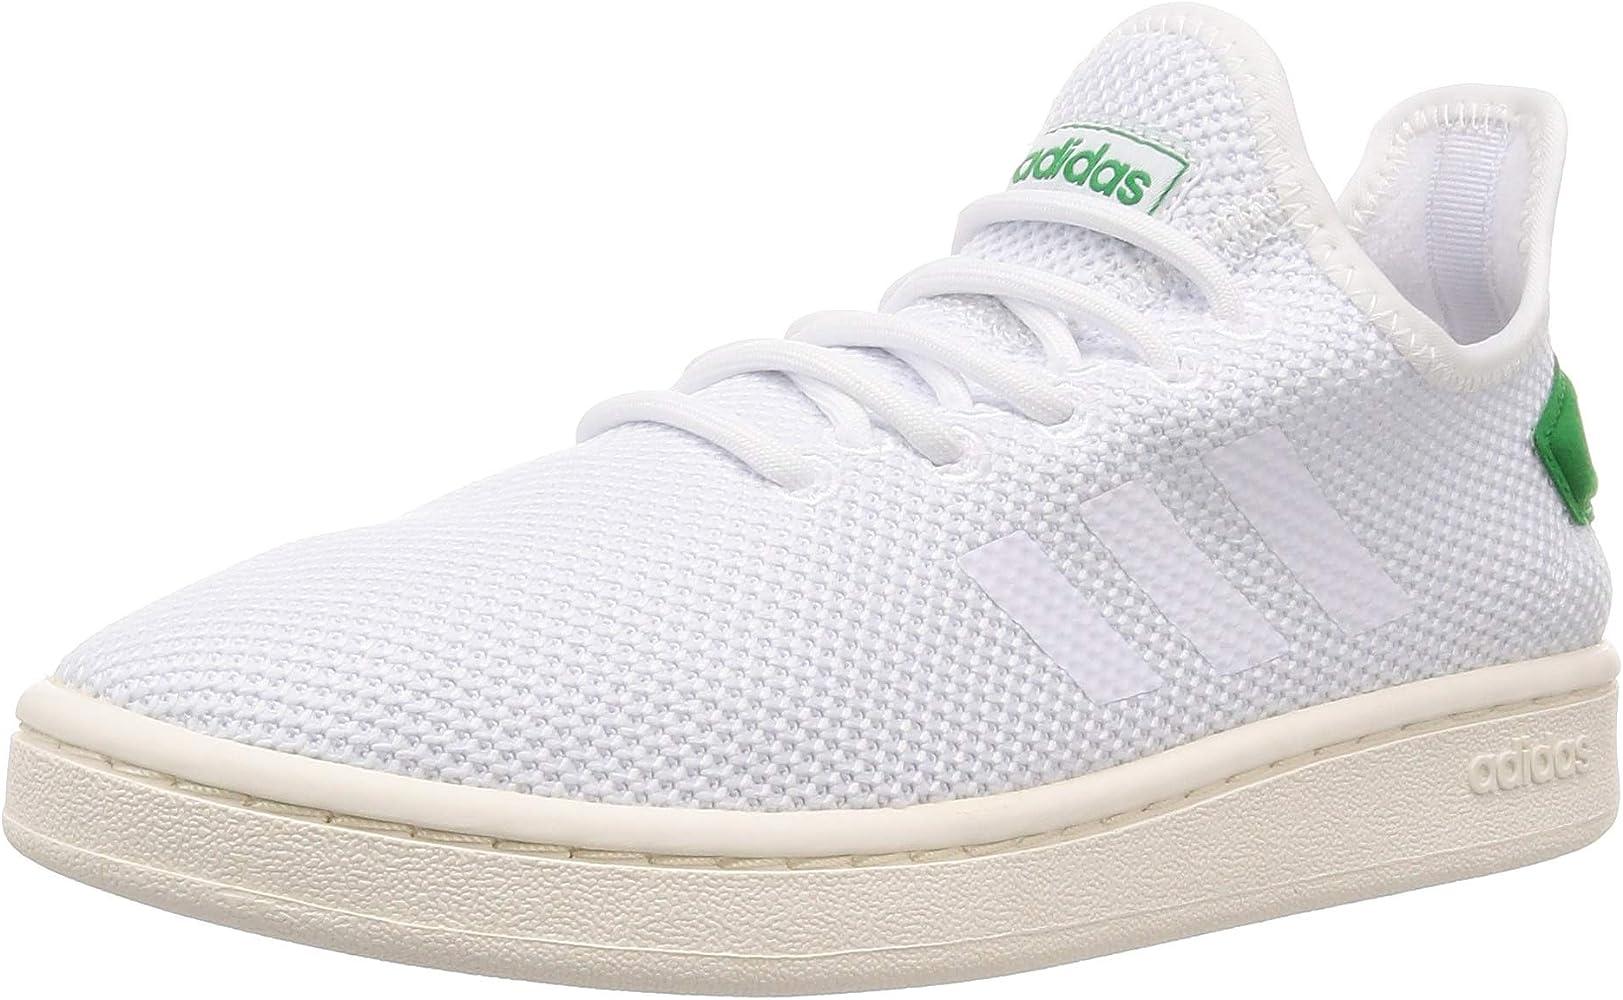 Adidas Men's Court Adapt Tennis Shoes